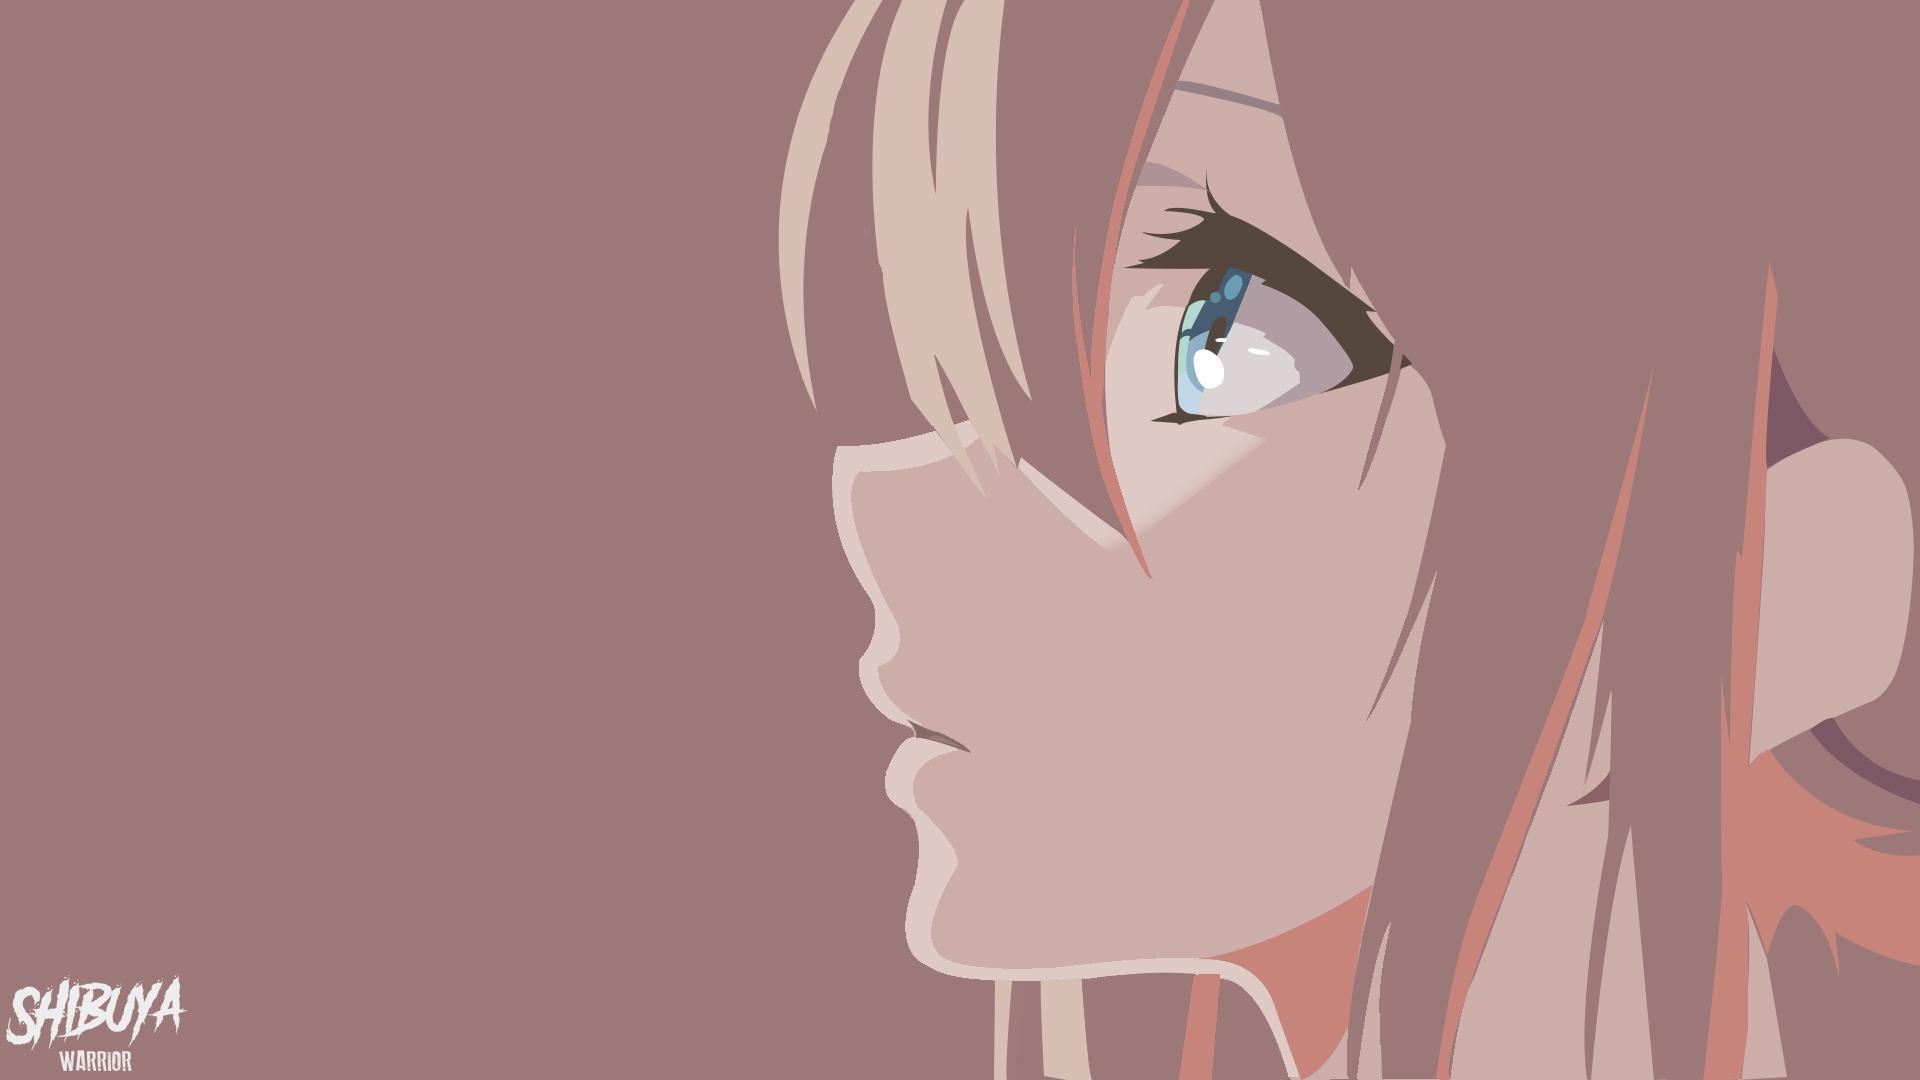 Anime - Violet Evergarden  Violet Evergarden (Character) Wallpaper